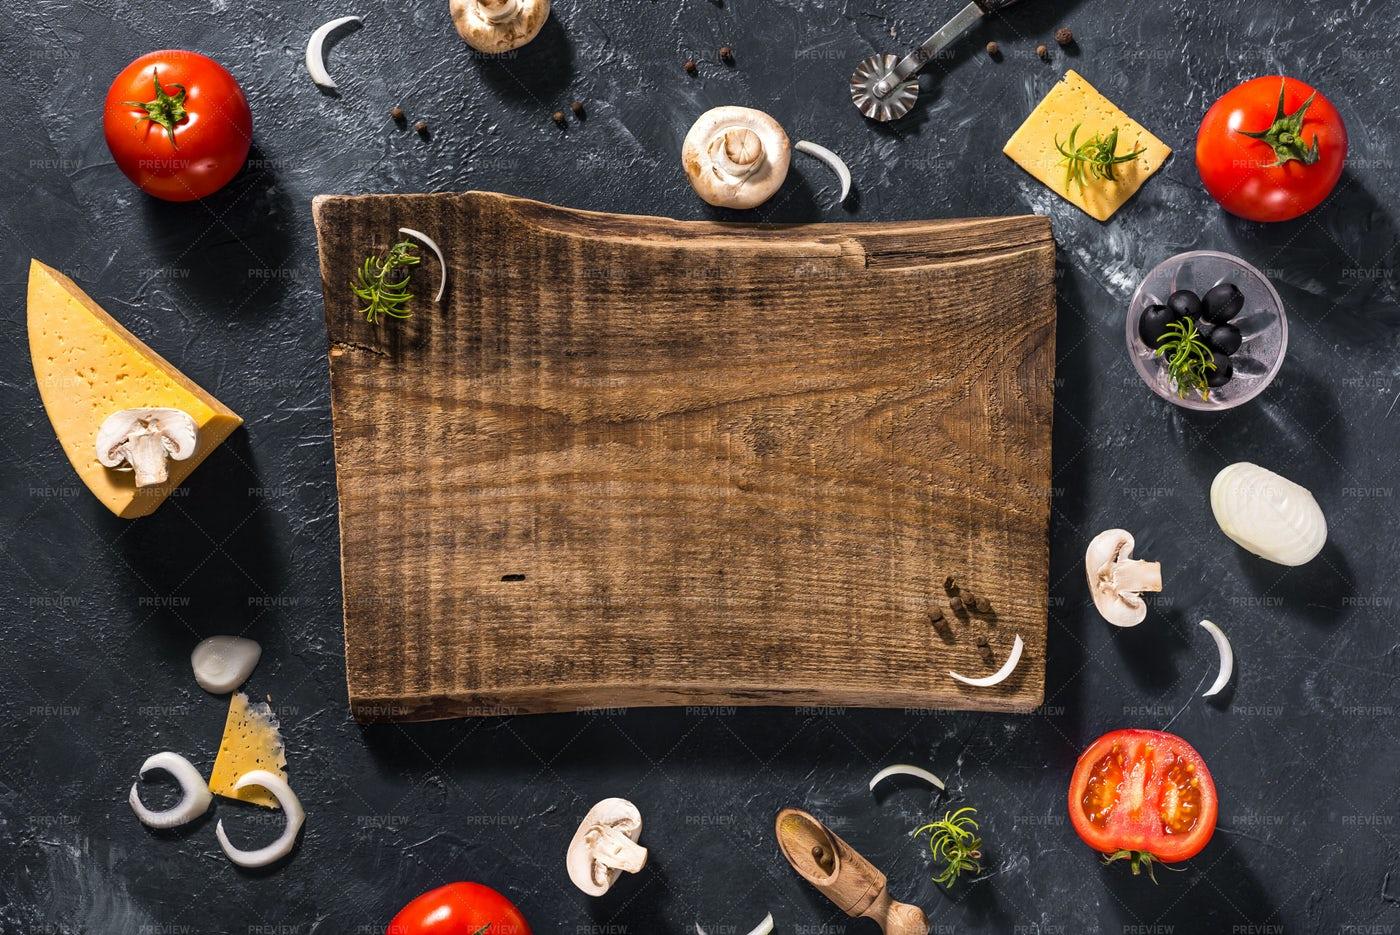 Ready To Prepare Pizza: Stock Photos